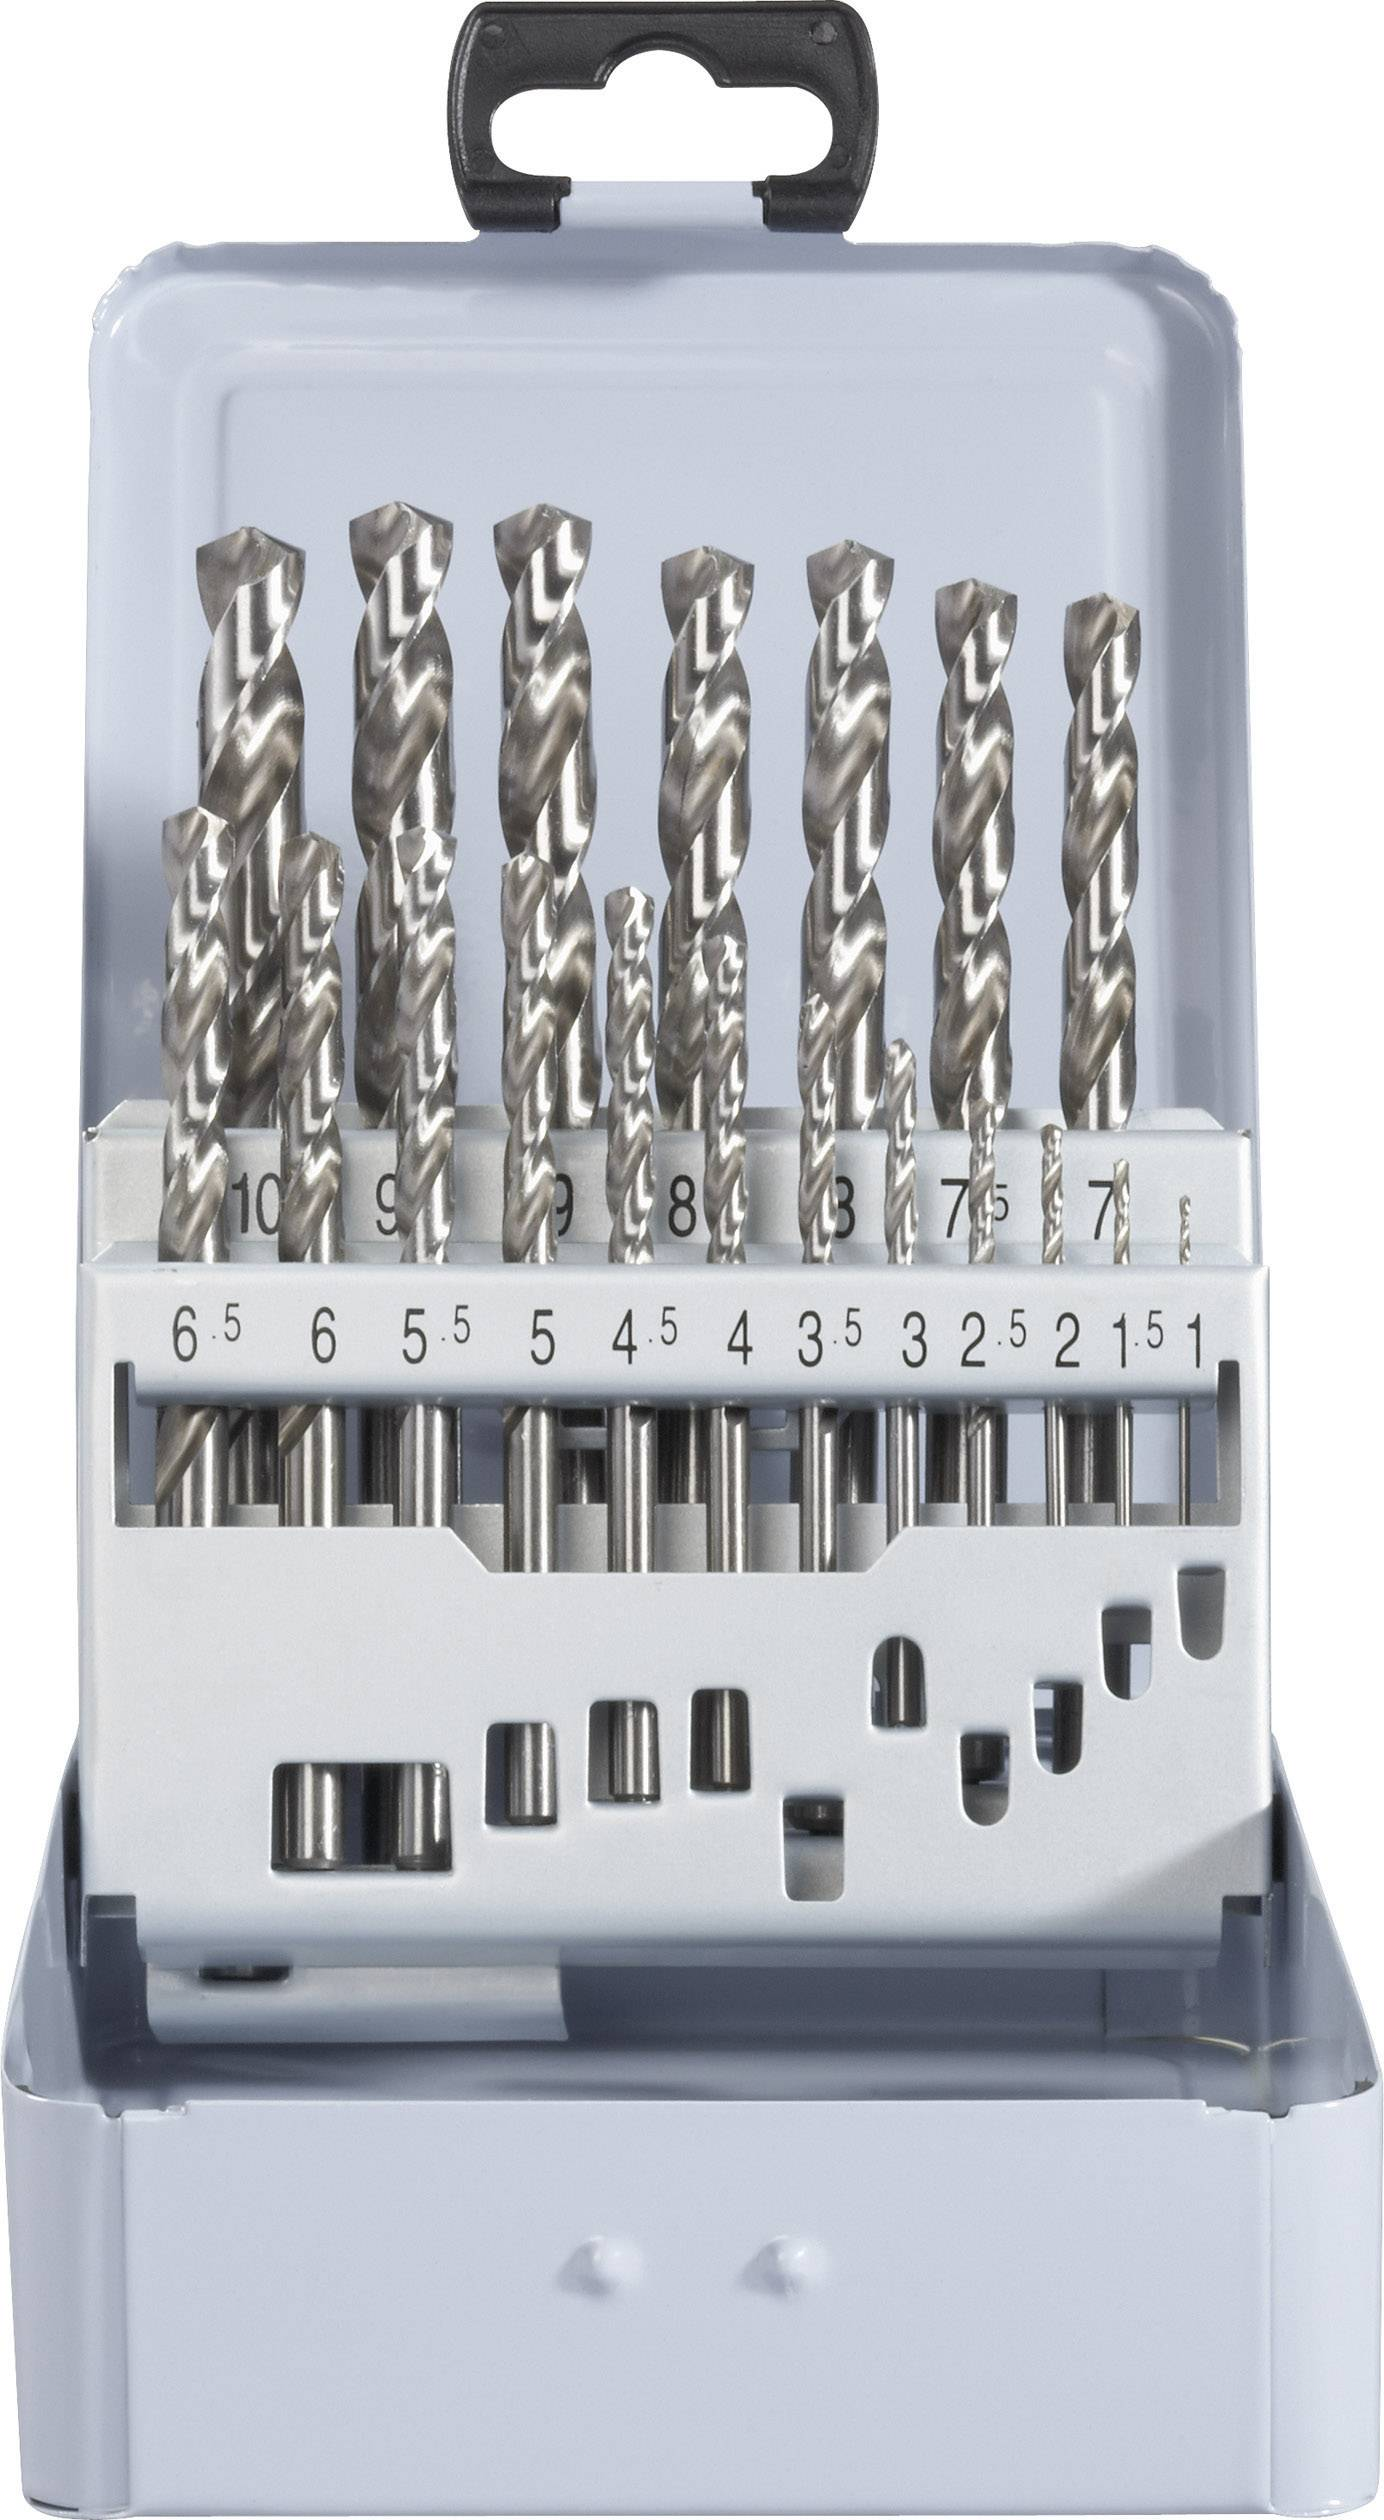 19-dílná sada spirálových vrtáku HSS-G DIN 338 RN